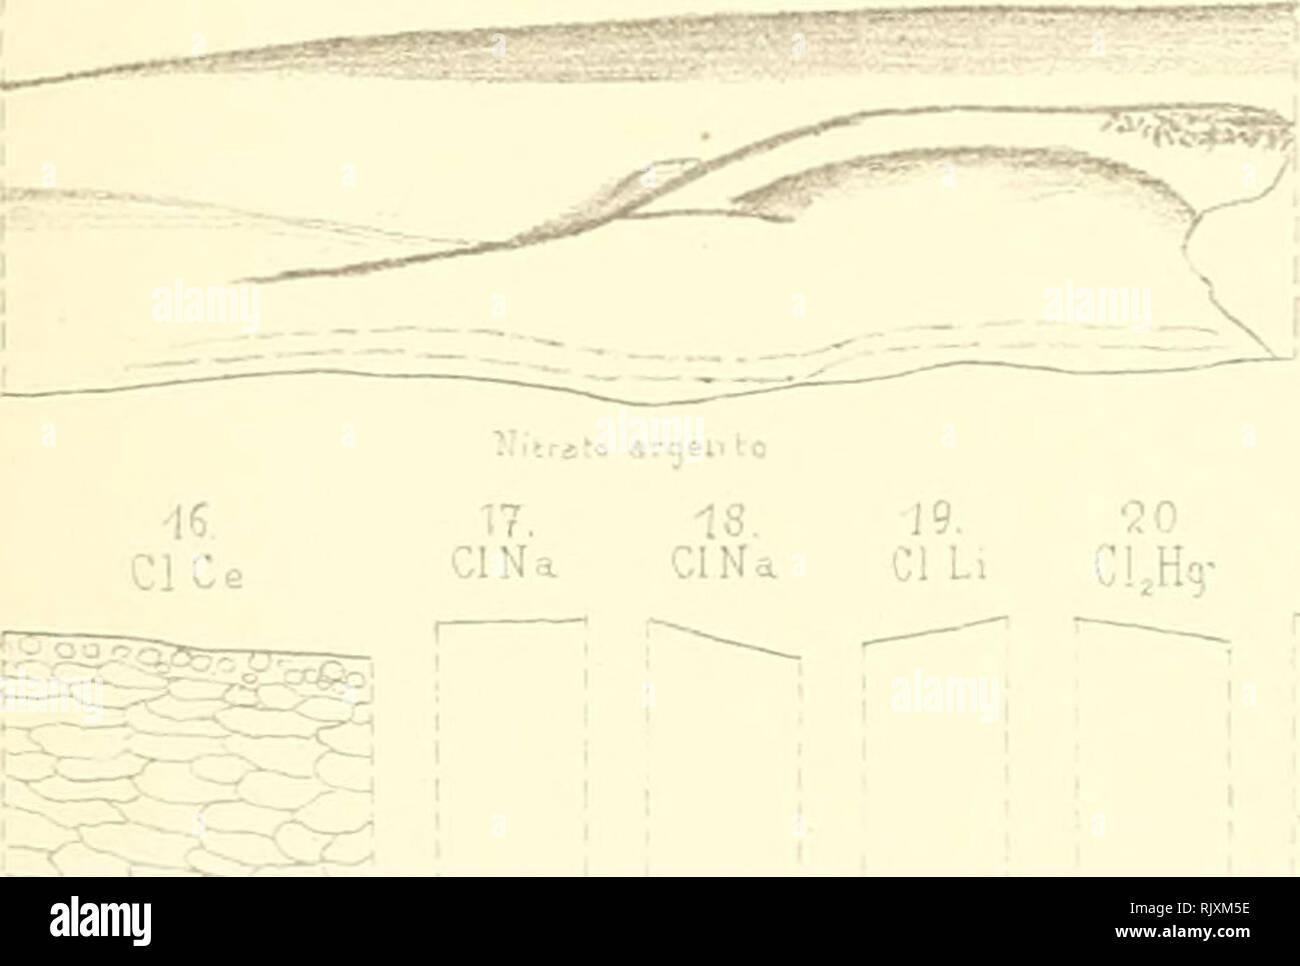 ". Atti. Las plantas; Plantas -- Italia; Cryptogamia; de la micología. Arti cl(>ll Isl? Rorcinko Univ. di Povi.uVol.XI Tav.lX 1 2. 3. 4- 5 6 7. 8. 9. 10. Vò 14. 15. Cy.FeK C^.Fei; Cy.FeK, cy.FeK, Cl^Hg Cl,HG K K CI CI CI CI Ce Ce CU,.,.... Cina al cina al '° ^%? ^xV ^$s PMNO;/ 'â PMNO,), i/uo'uuit' o.iru ""g^a *Â""Â""So -etrii'. ;Rj^ nm, -â' ^= AgNO, AqNO,. 19. ¢JO 21 CIL, C!,H9- CLHg .i.Â""'j,jNC, 12. AqNO, :1K 25. CIK 27. AoMO. g""""} AgNO, AqNO, 26. Aqh,-ho, 30. AgNOj AqNO, 23. V '''tór' L.Buscalioni supr. lil.Tacctiinardi jLperrarì.Pavii. Diffus Buscalionie Purgotti-Dissoc.e.deijoni.. P Foto de stock"